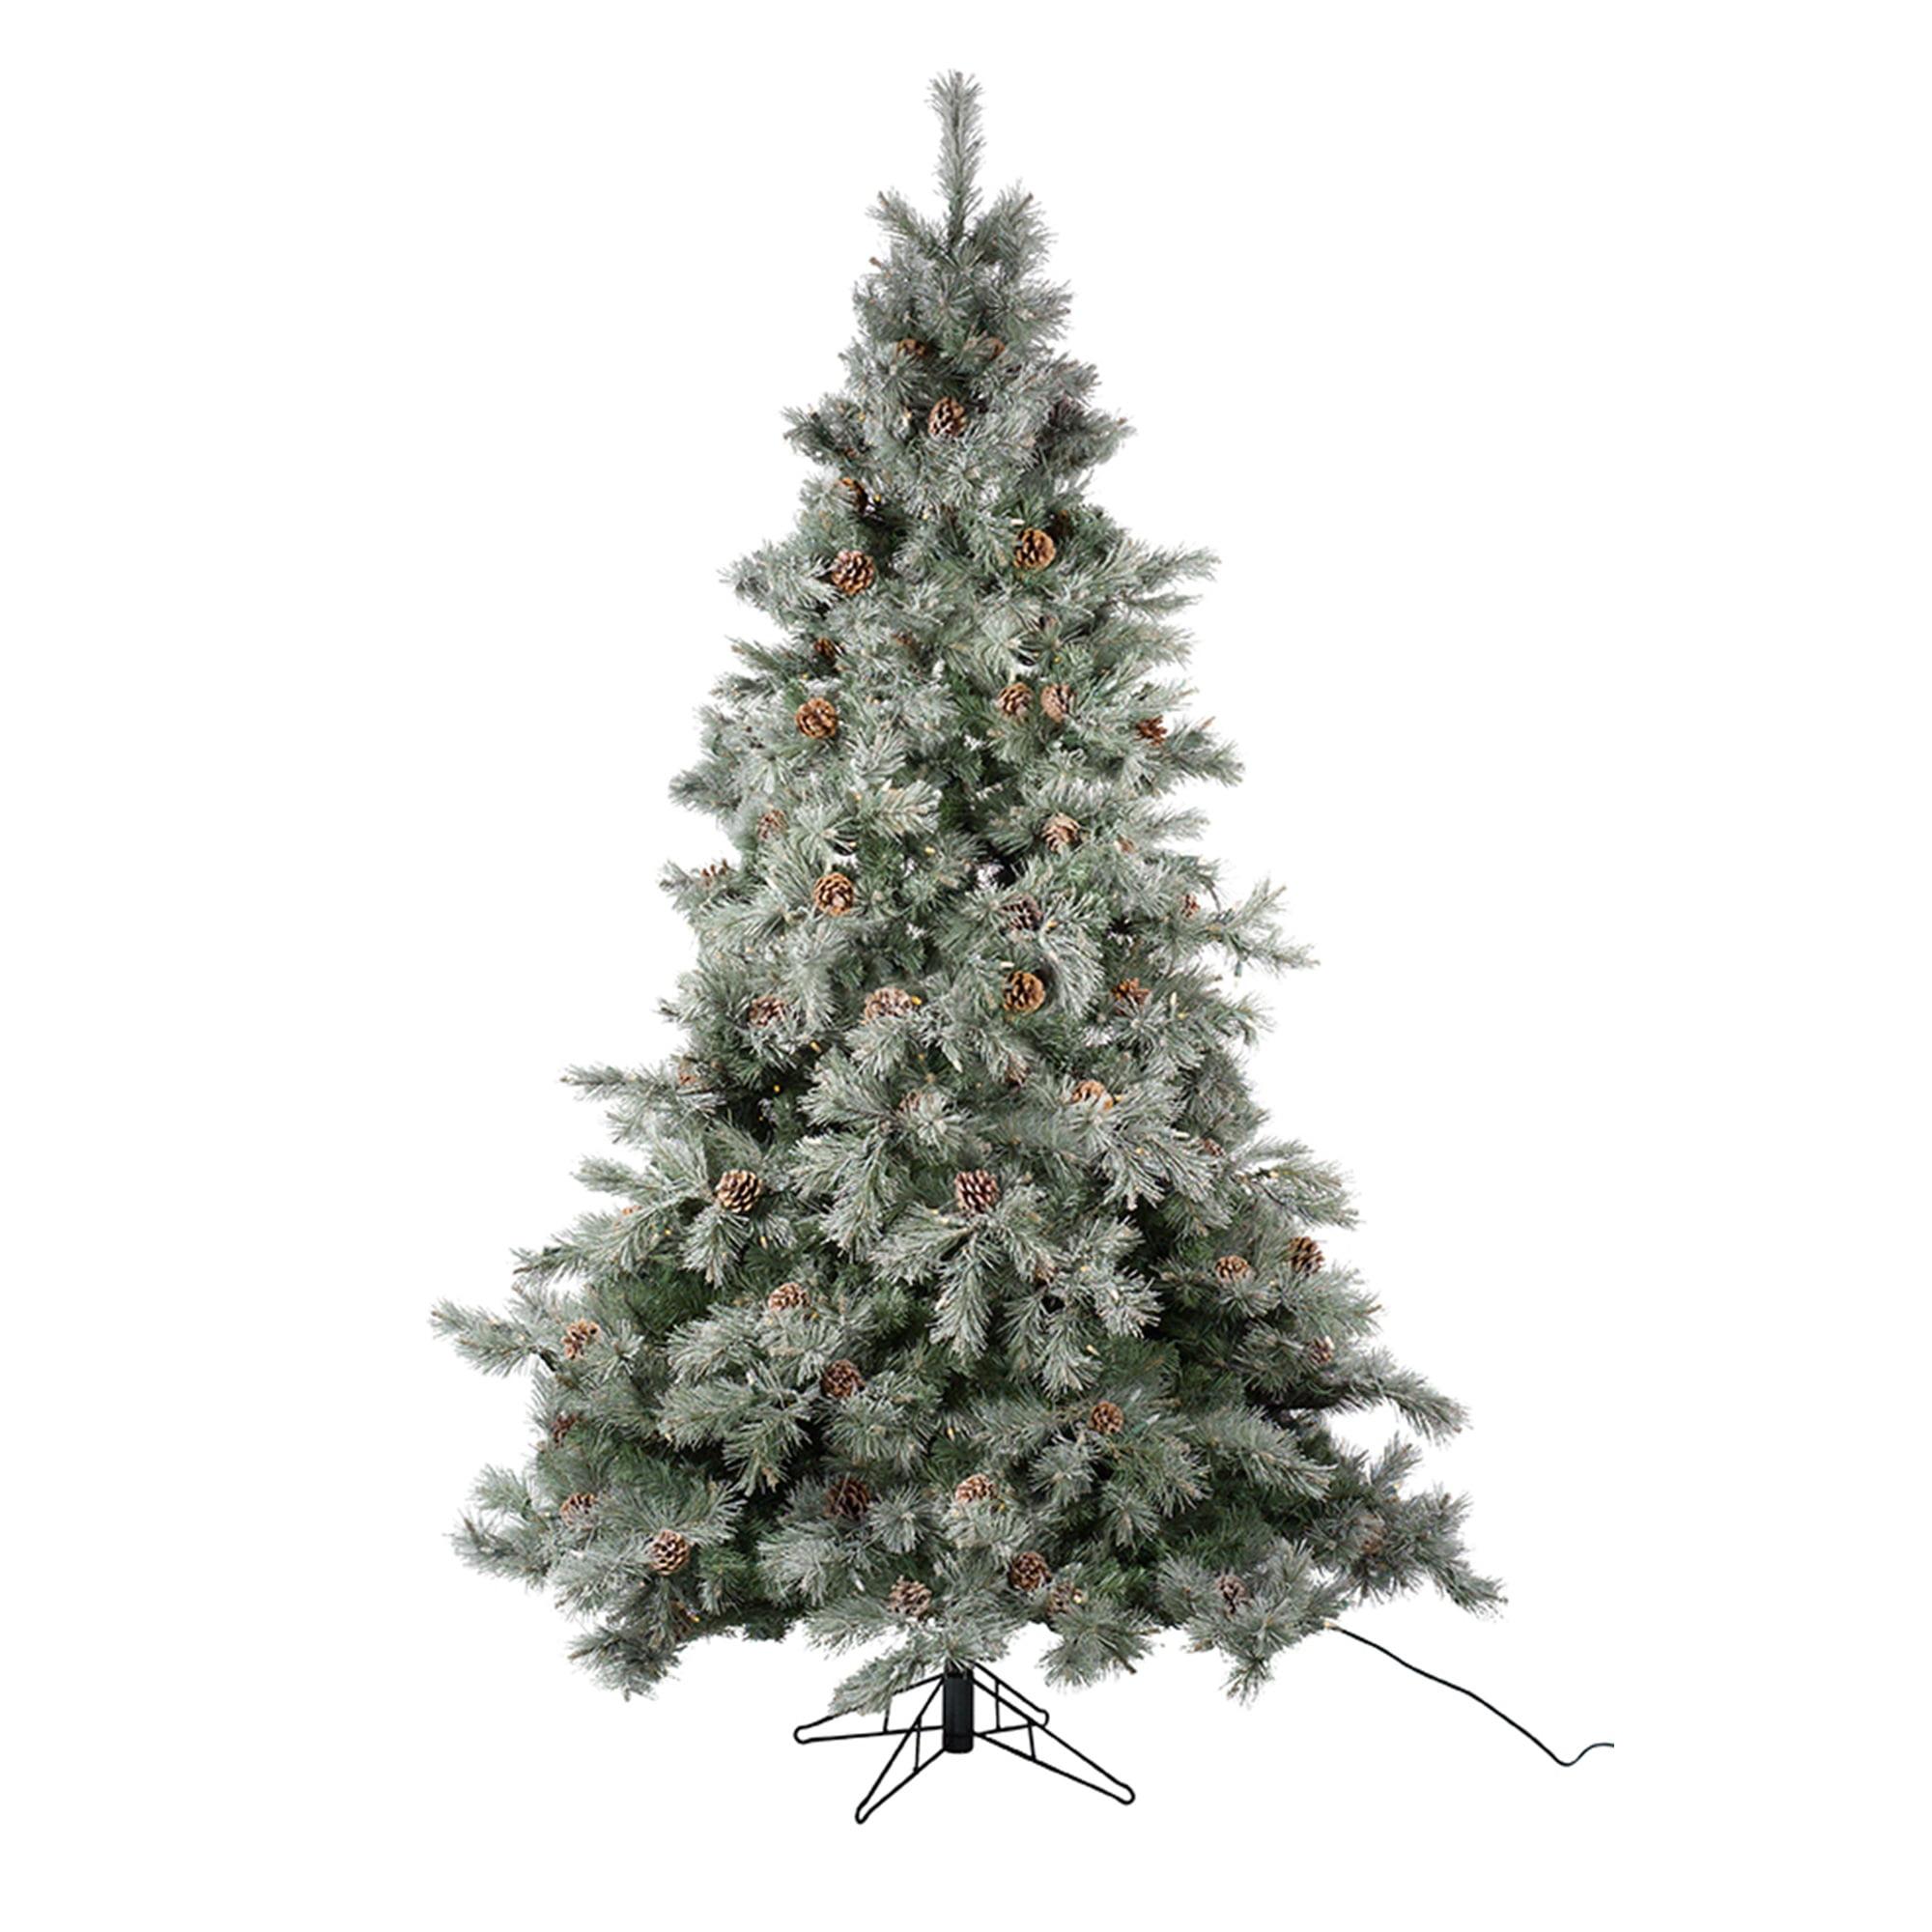 7 5 Pre Lit Frosted Pine Cone Artificial Christmas Tree Multi Color Lights Walmart Com Walmart Com